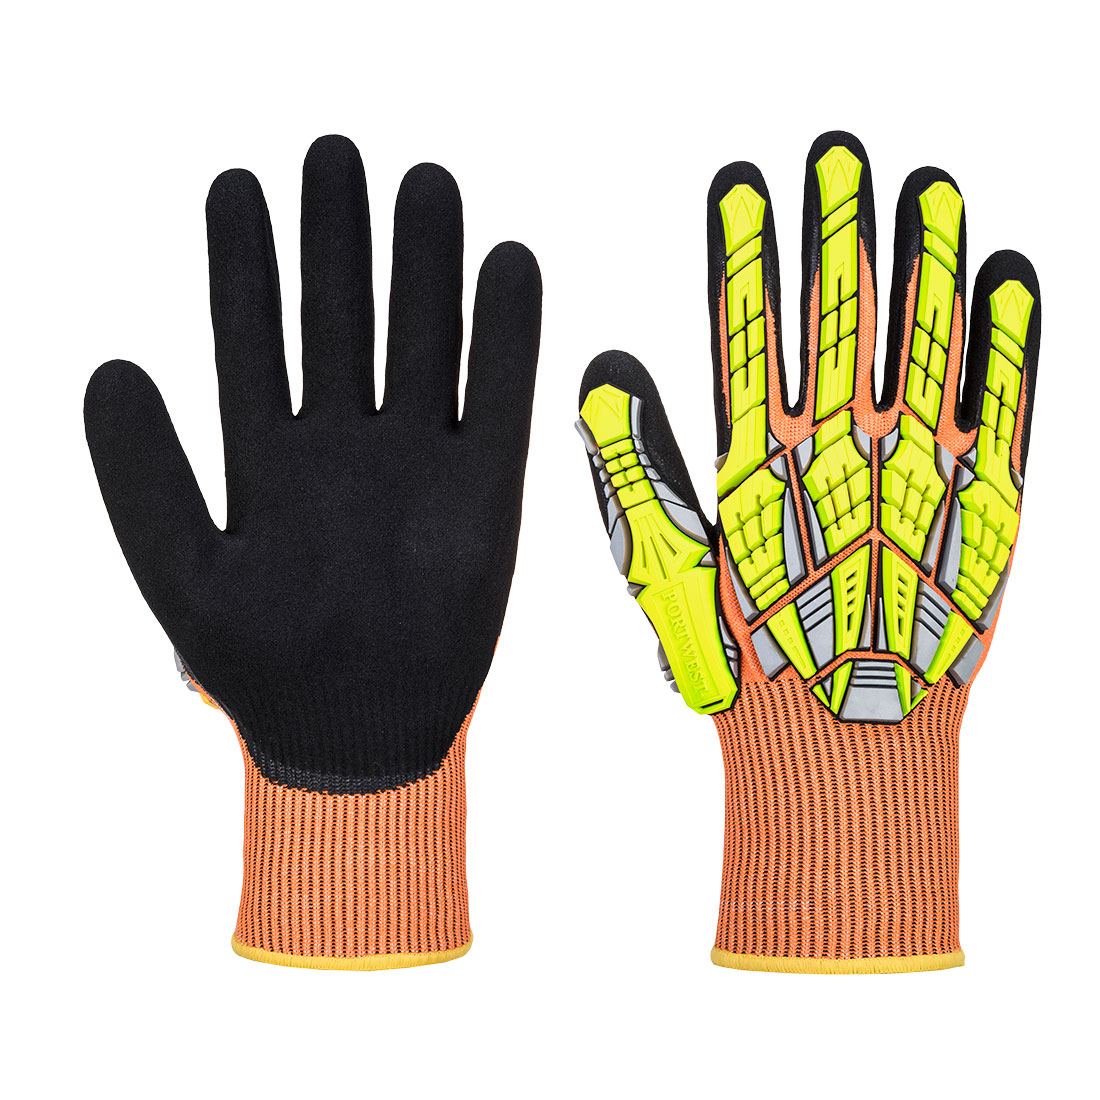 Gloves, Anti Impact Gloves